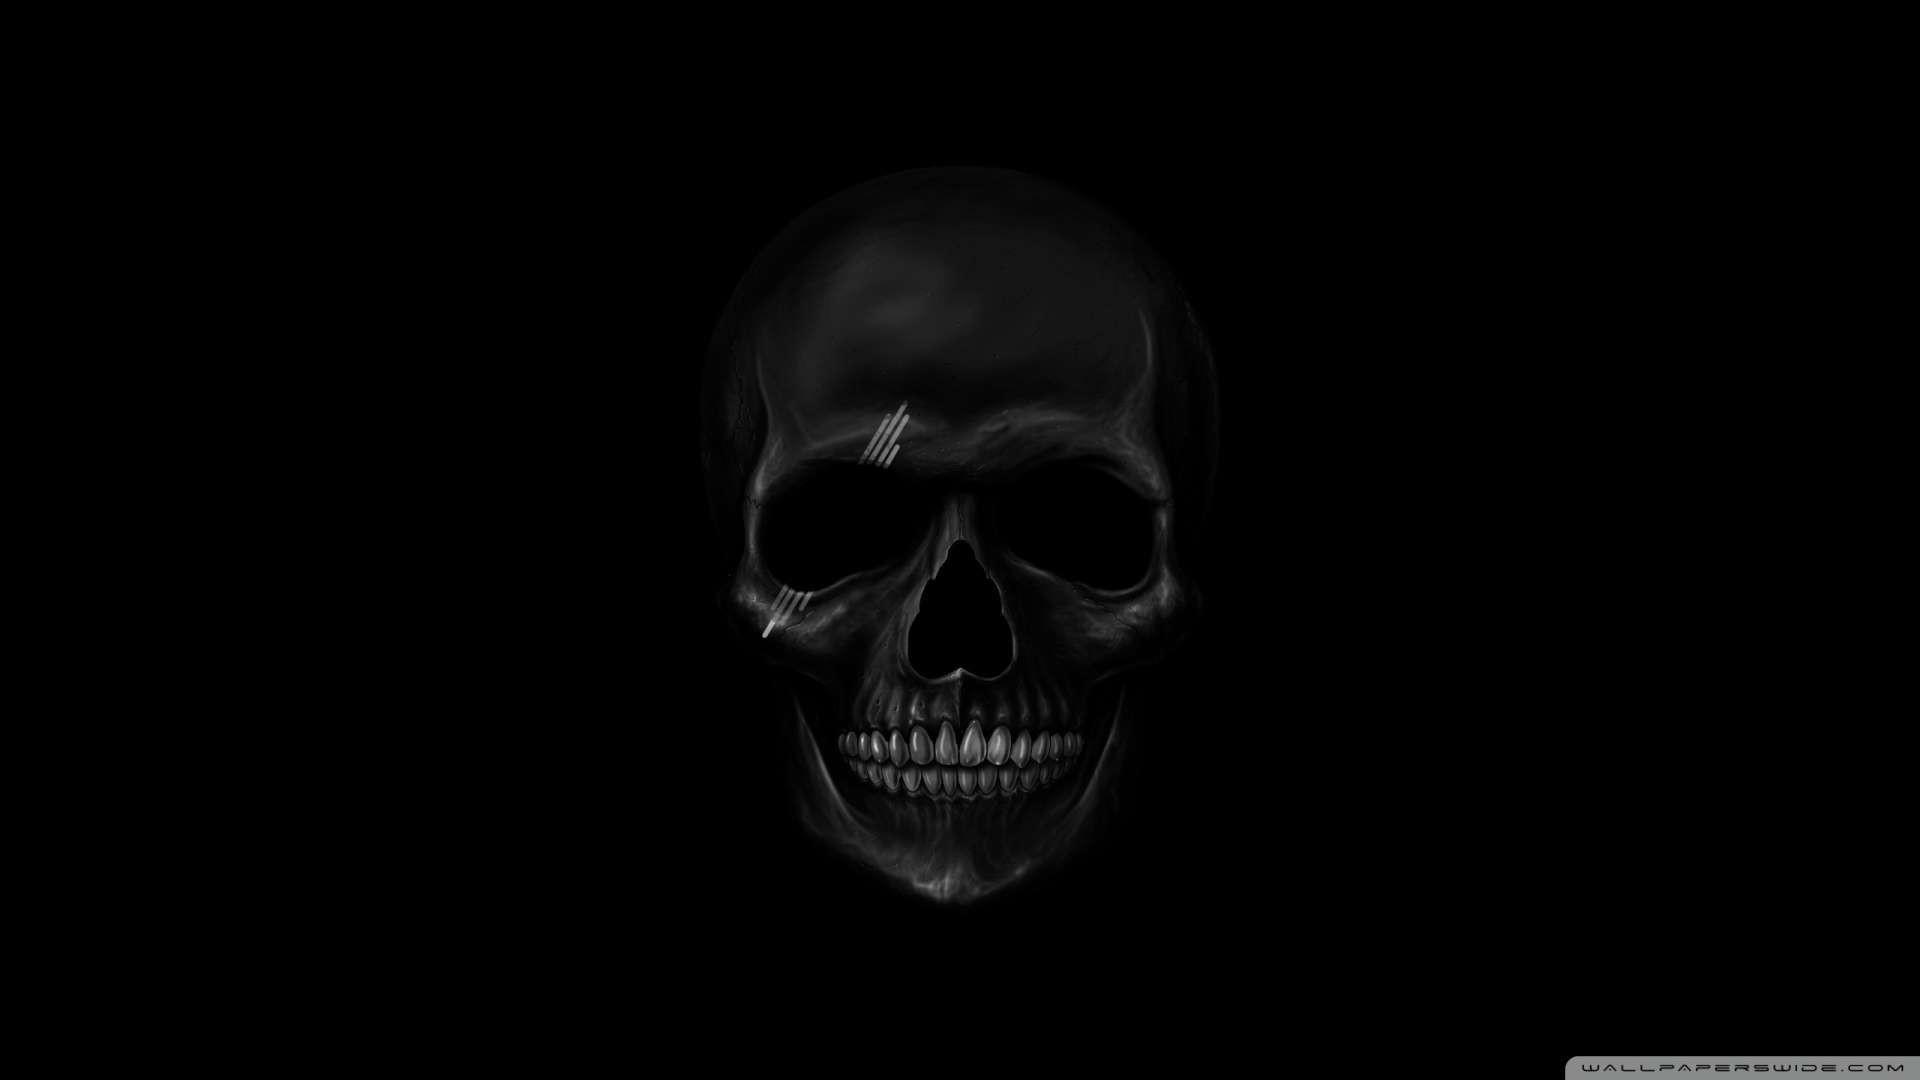 Skull Wallpaper 3d 49 Pictures